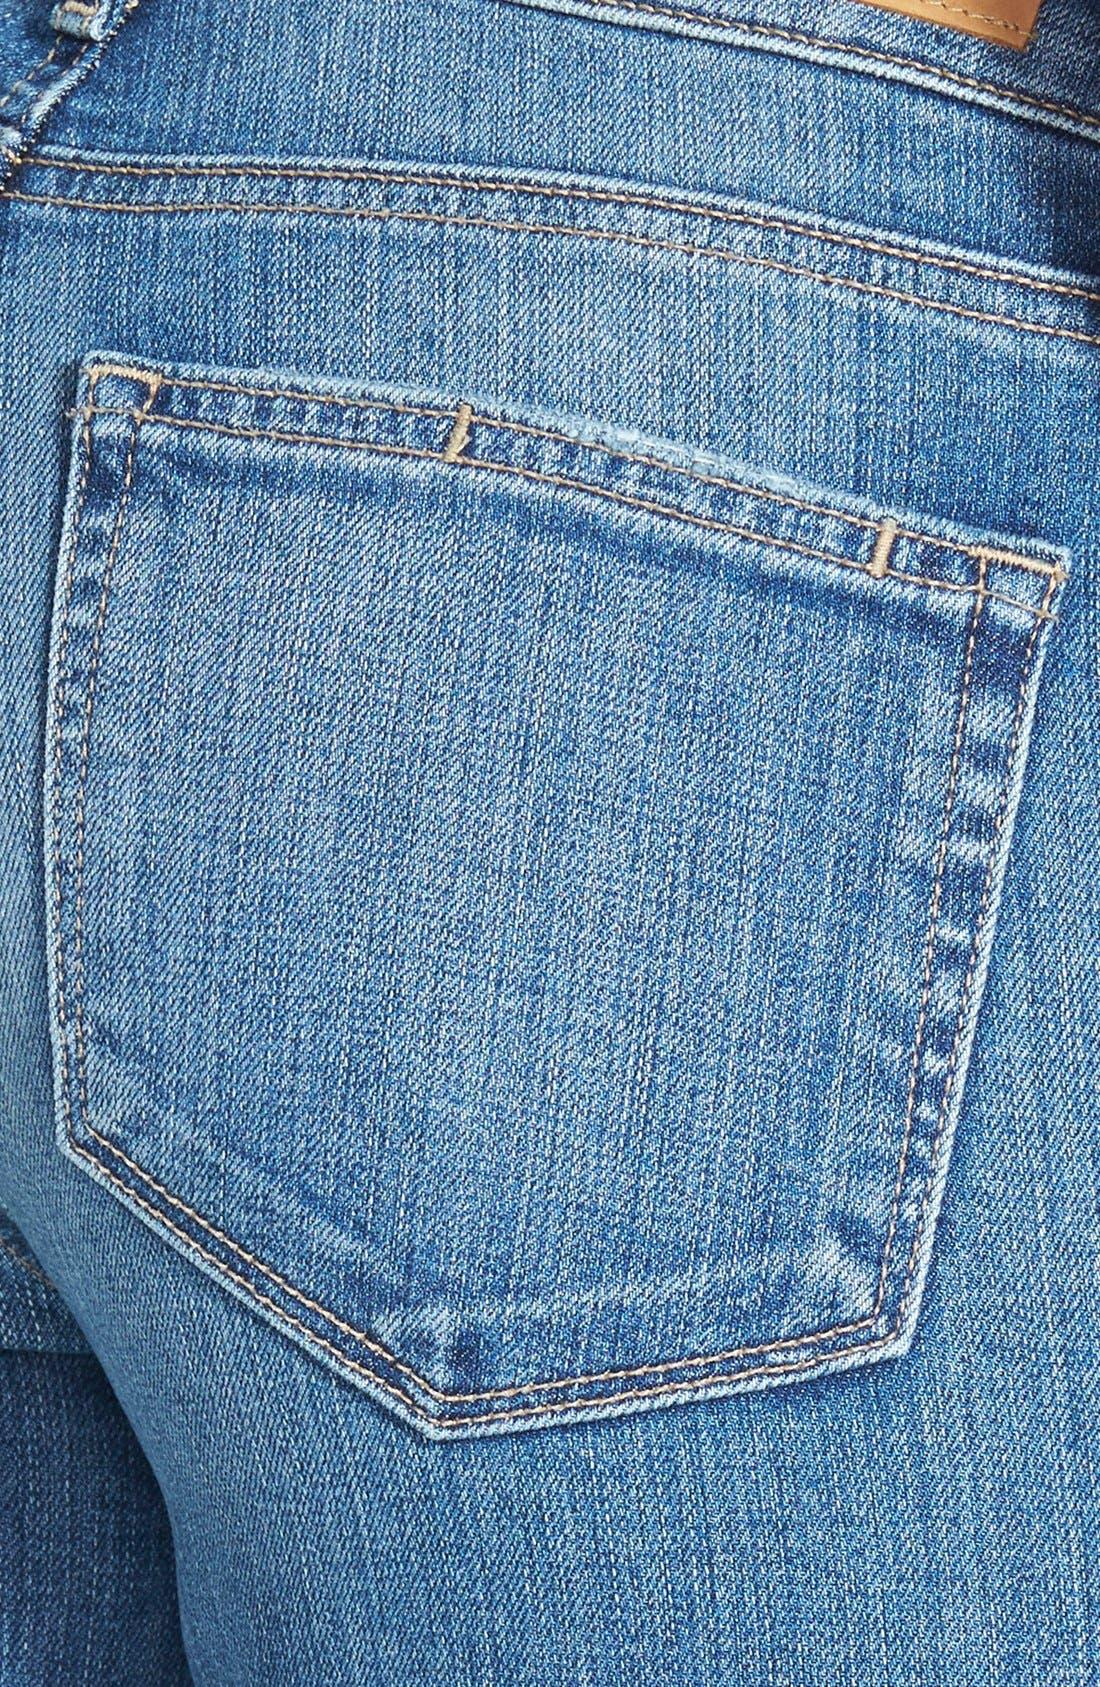 Alternate Image 3  - Paige Denim 'Skyline' Ankle Peg Skinny Jeans (Esme Destructed)